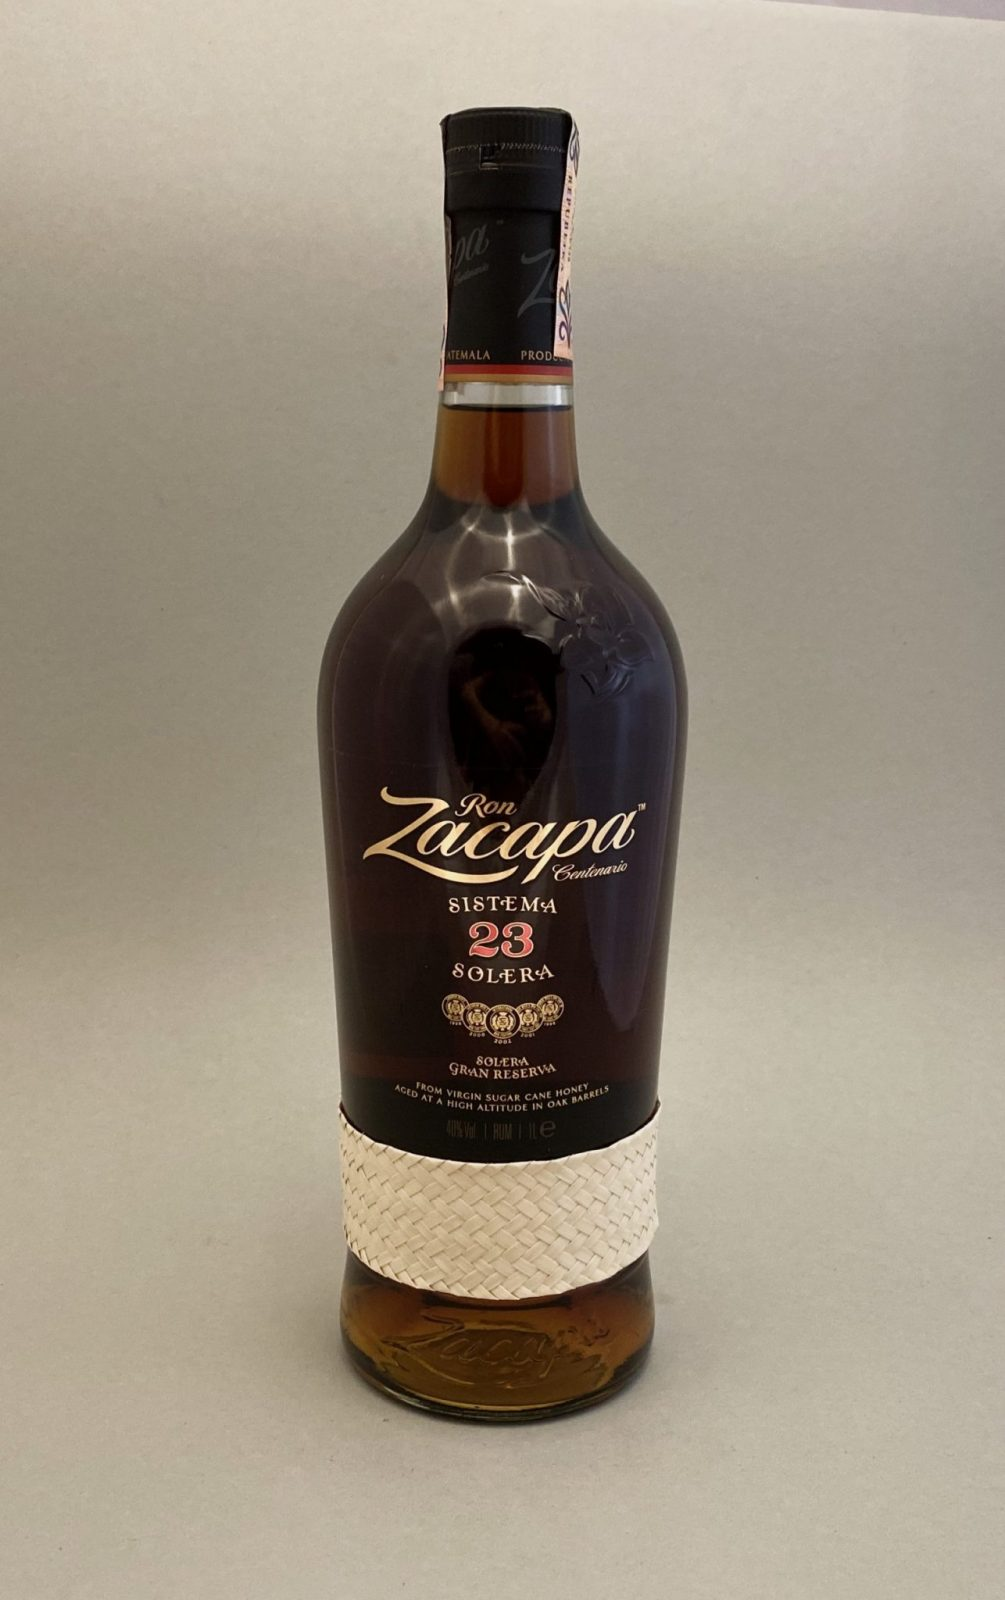 Zacappa Centenario 23YO 40%, Bottleshop Sunny wines slnecnice mesto, petrzalka, rum, rozvoz alkoholu, eshop